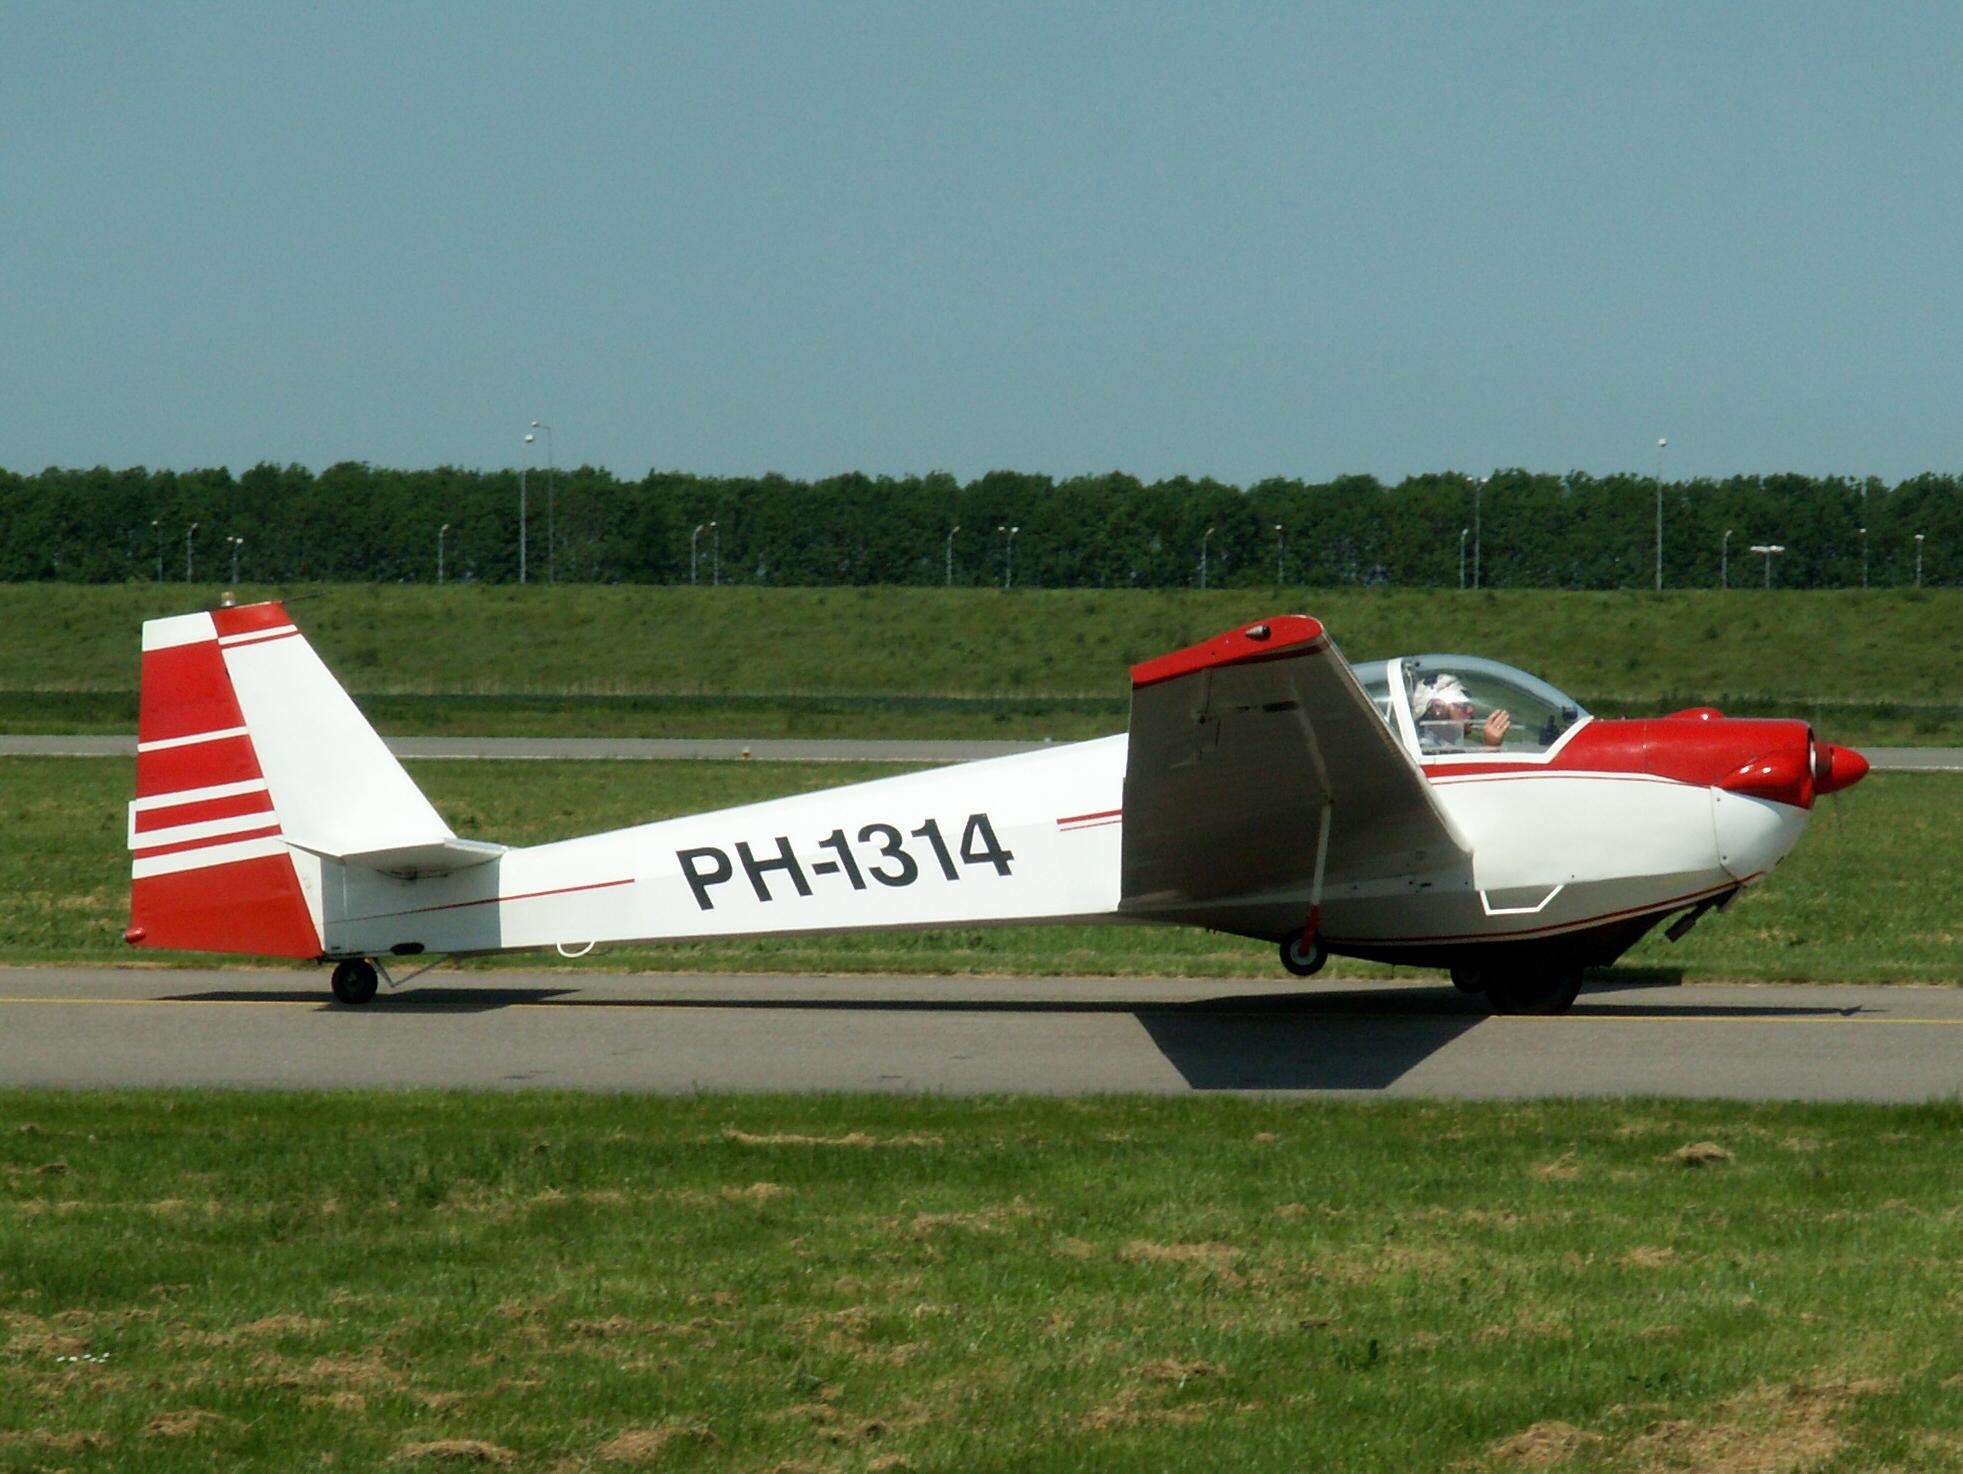 File:PH-1314.JPG